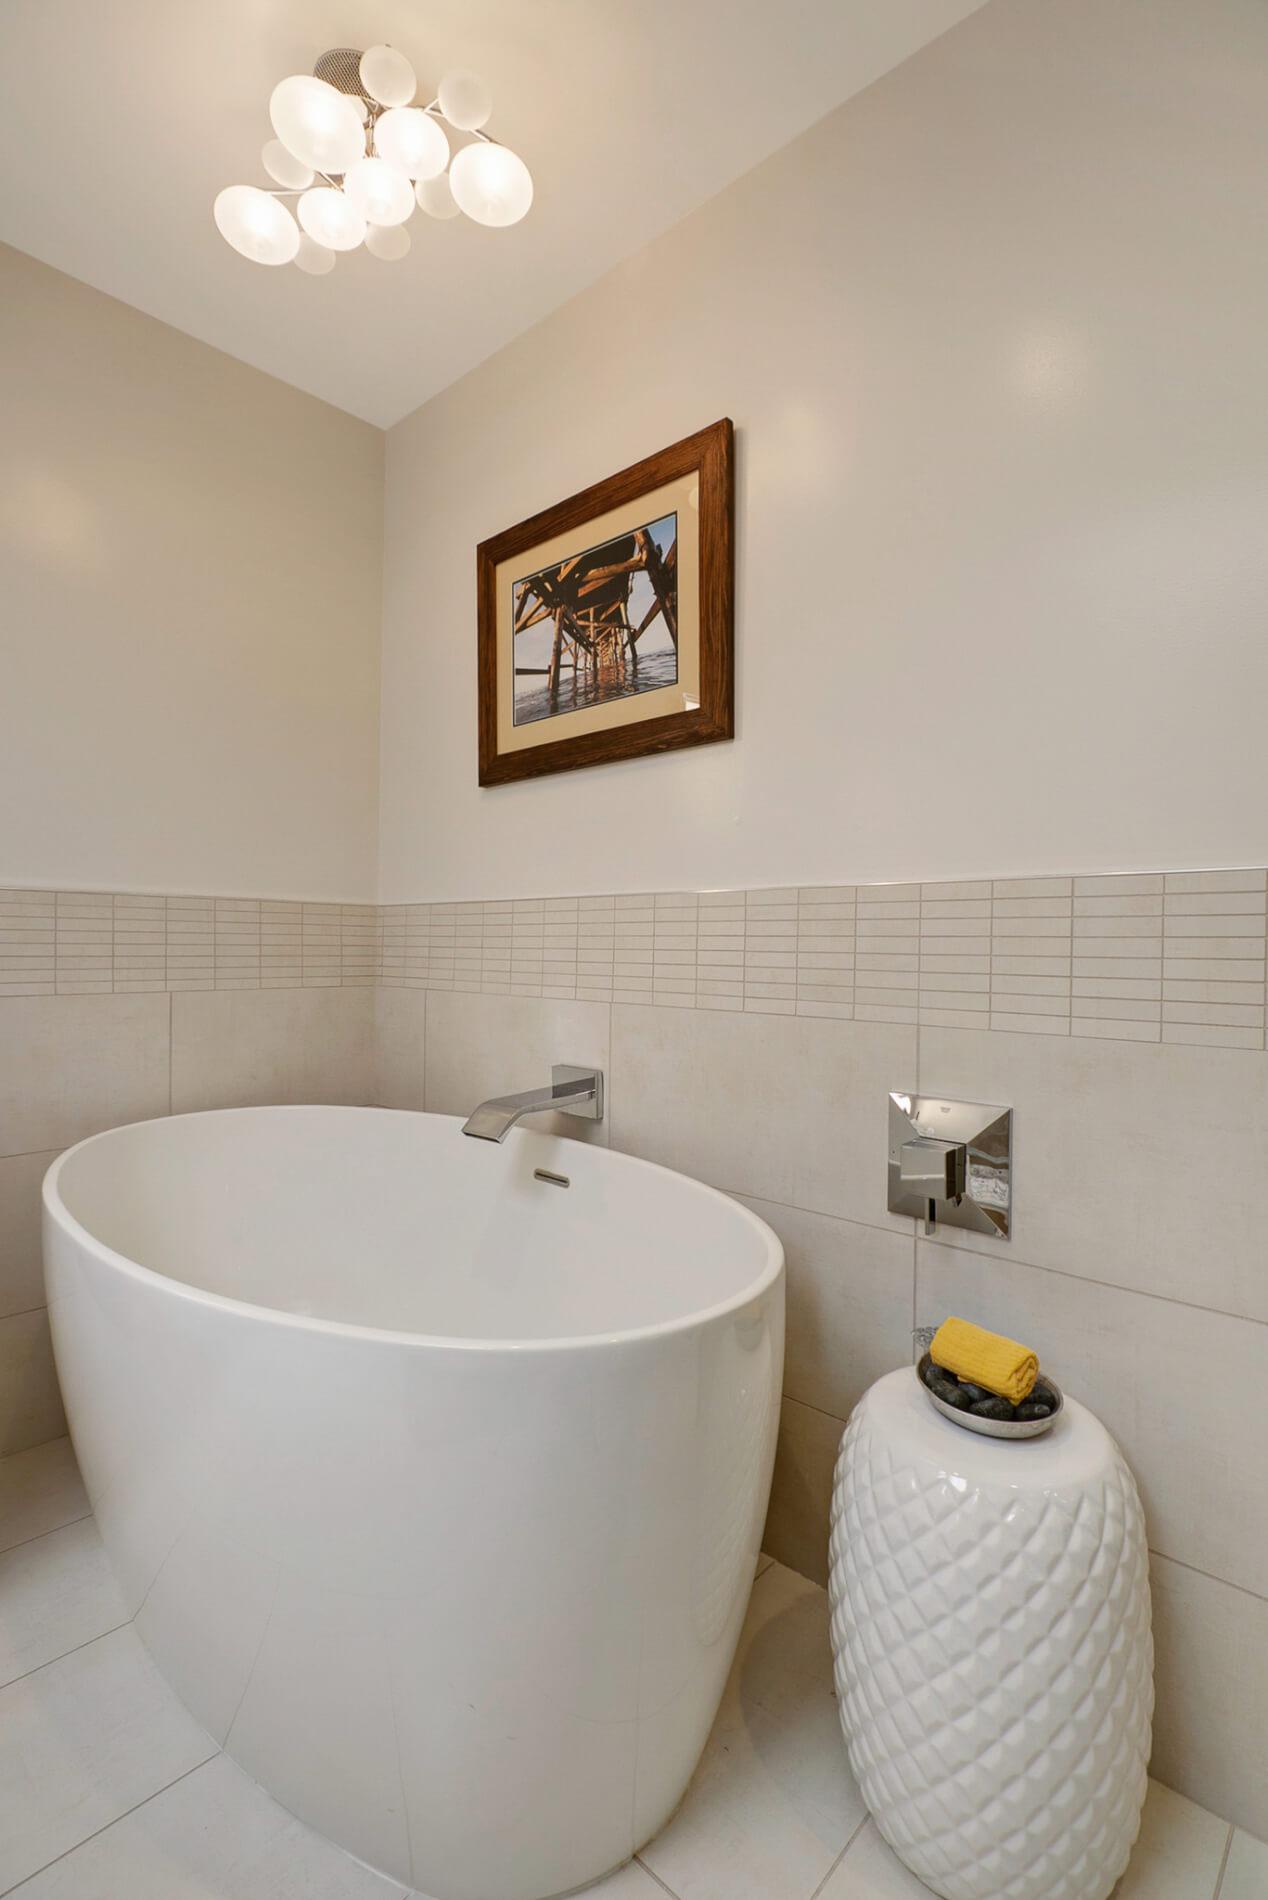 Free Standing Tub in Master Bathroom, Soaking Tub in Master Bathroom, Master Bathroom Tub